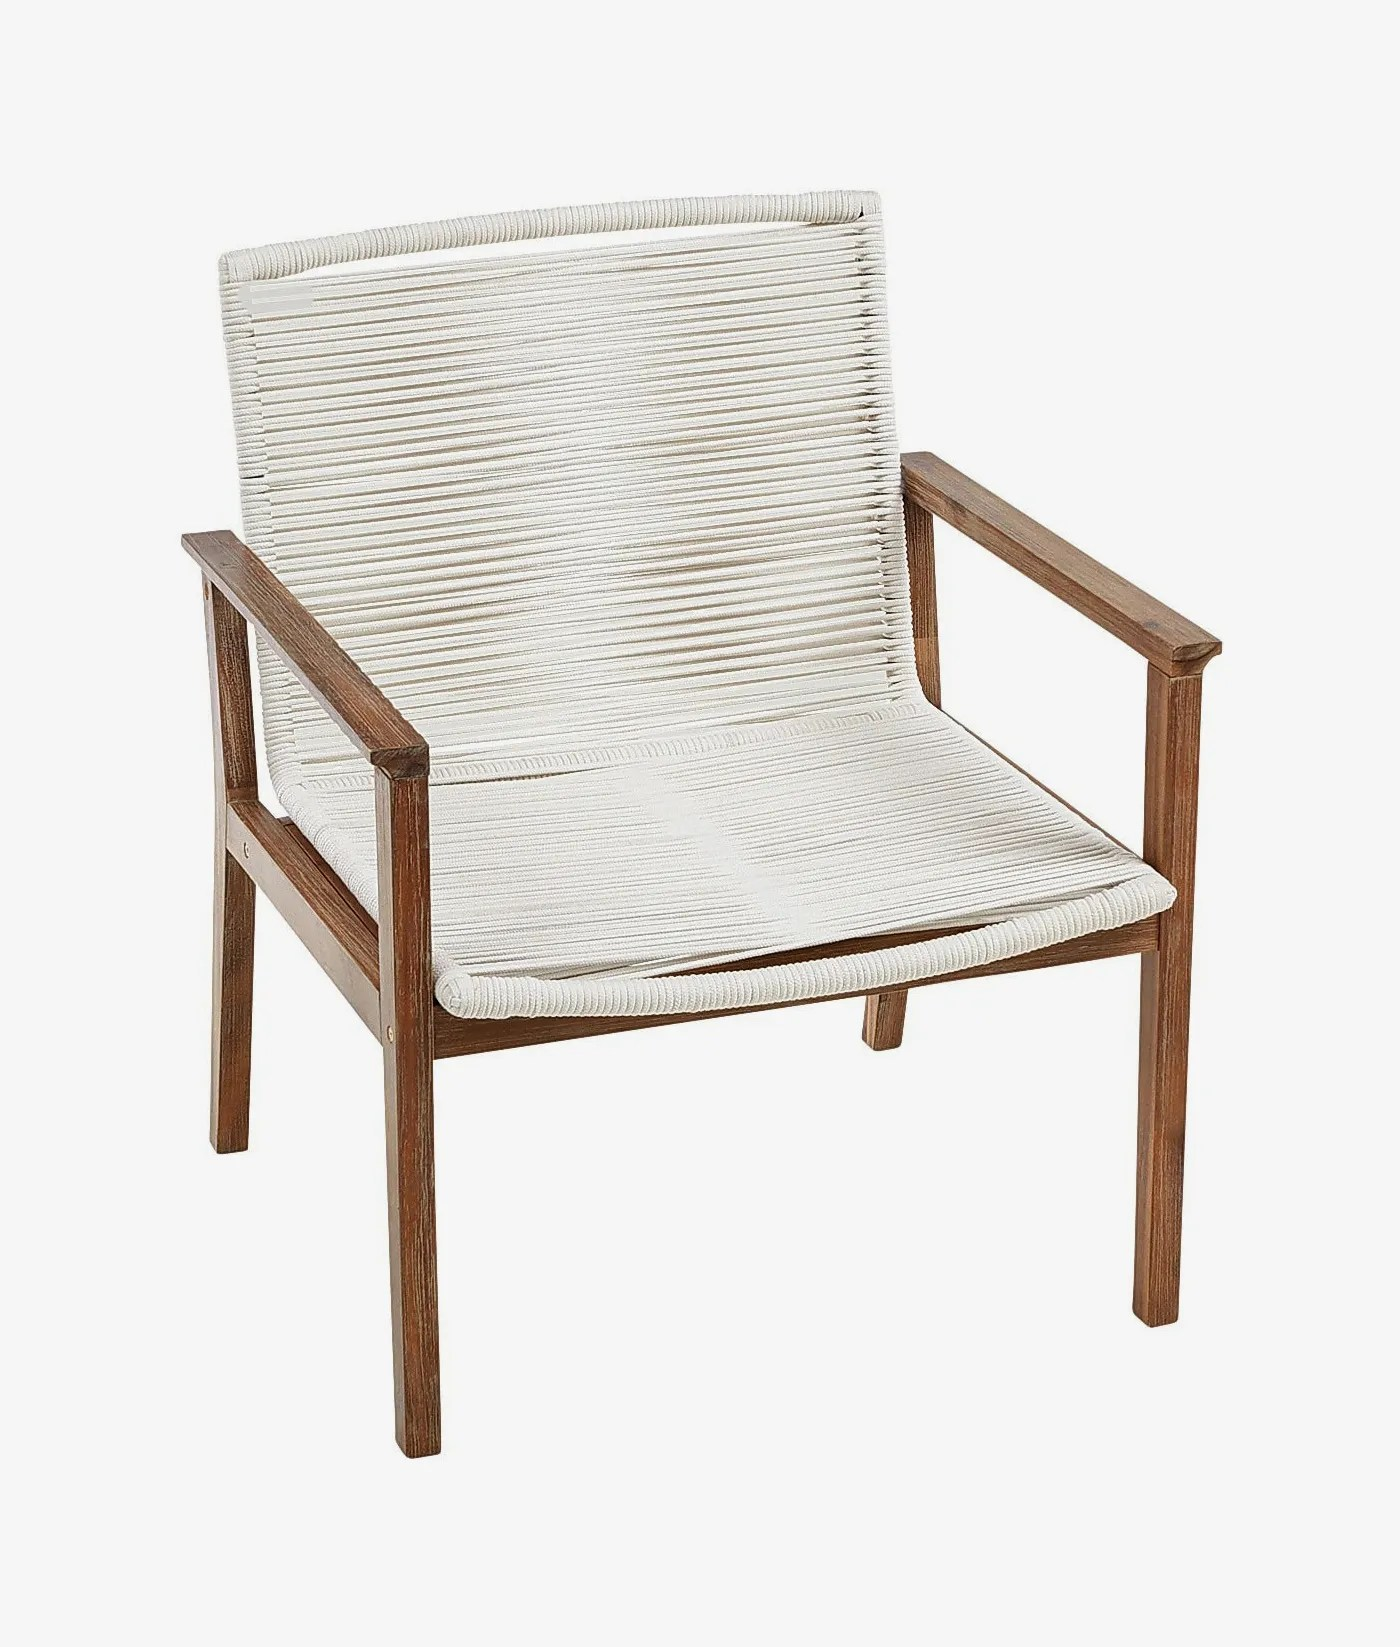 malta ivory rope chair